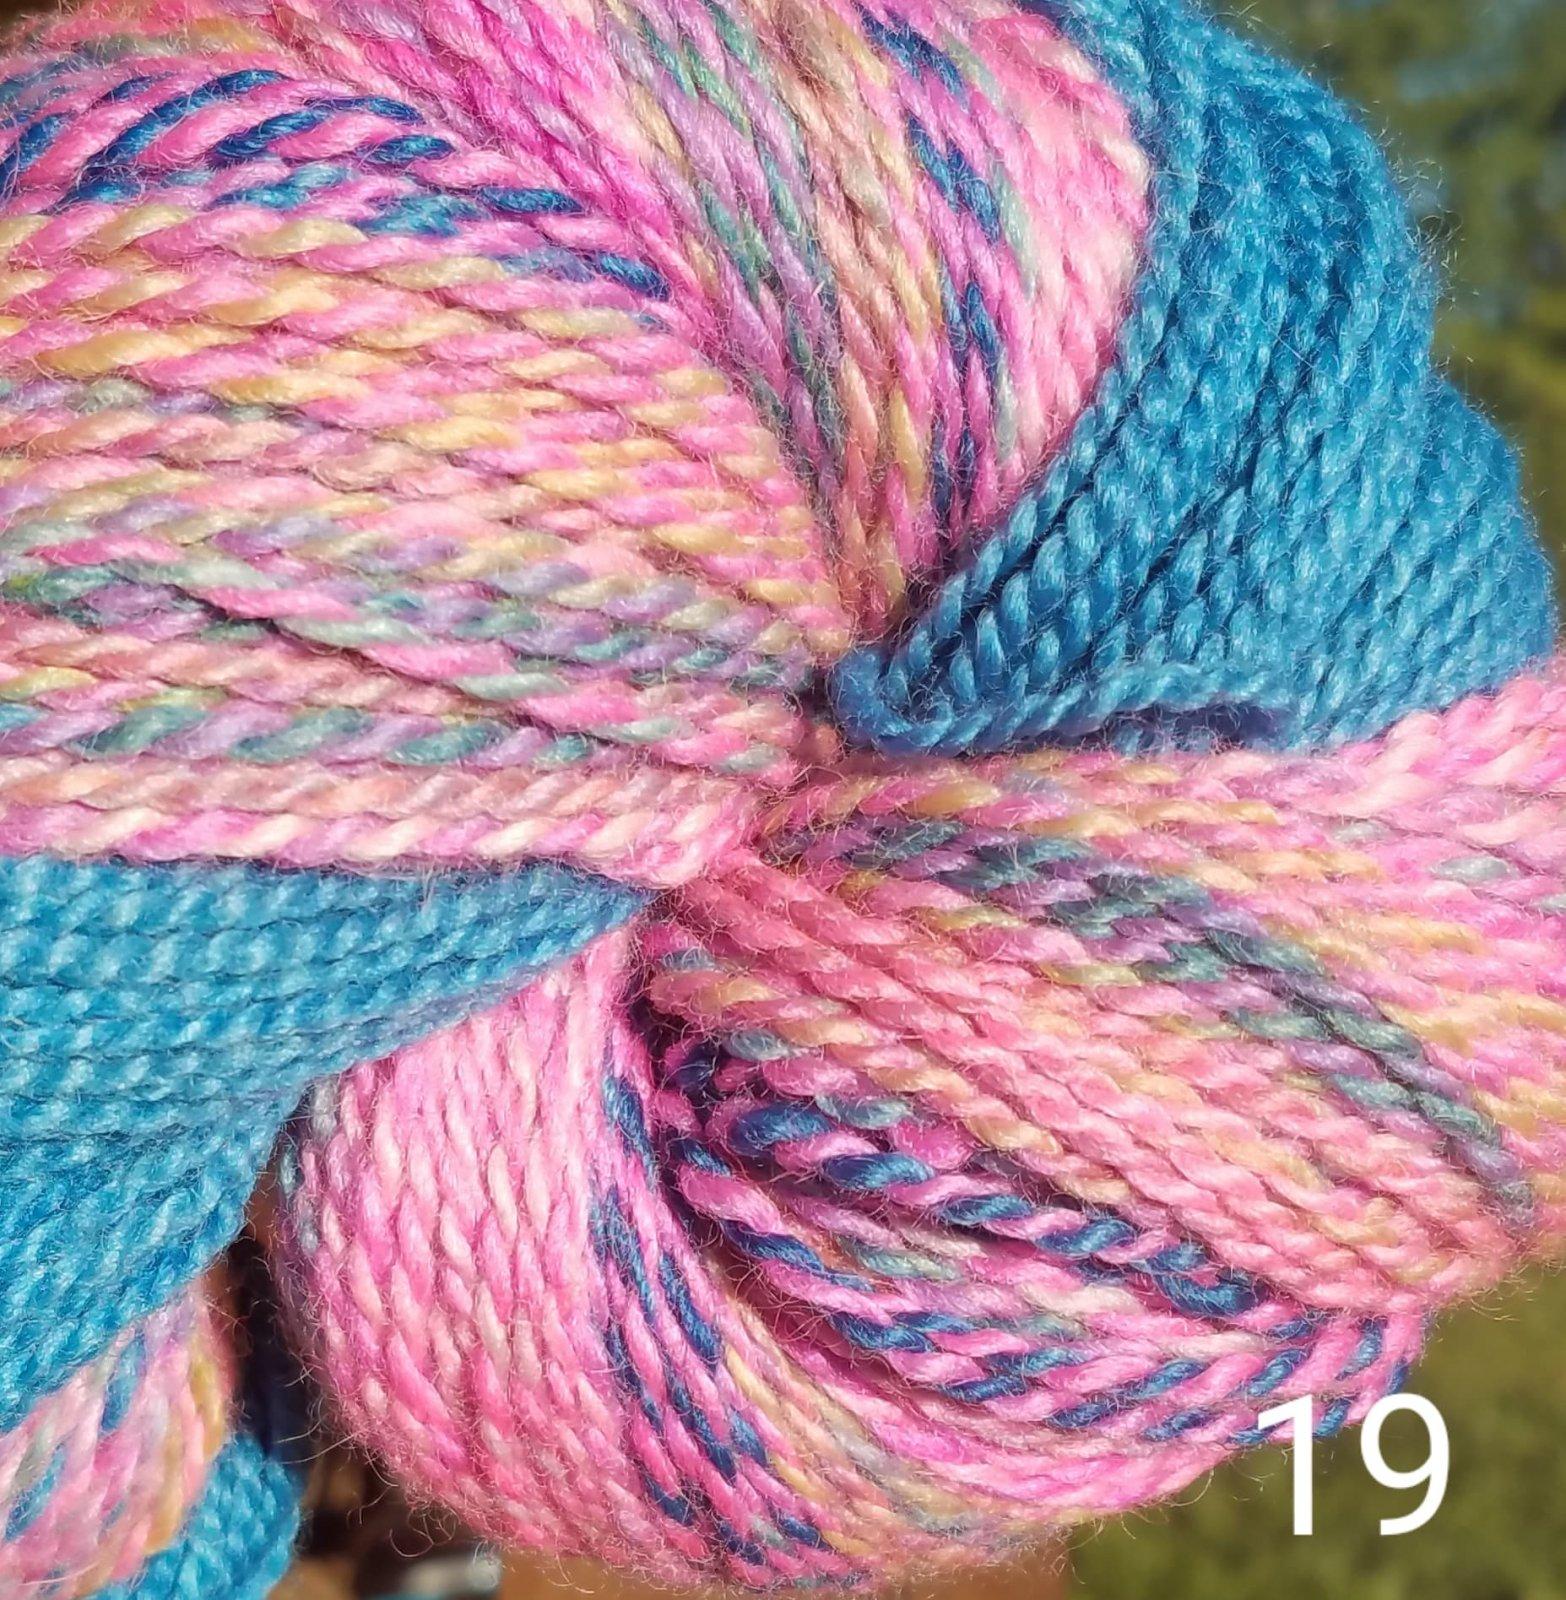 Yarn Bundle 19